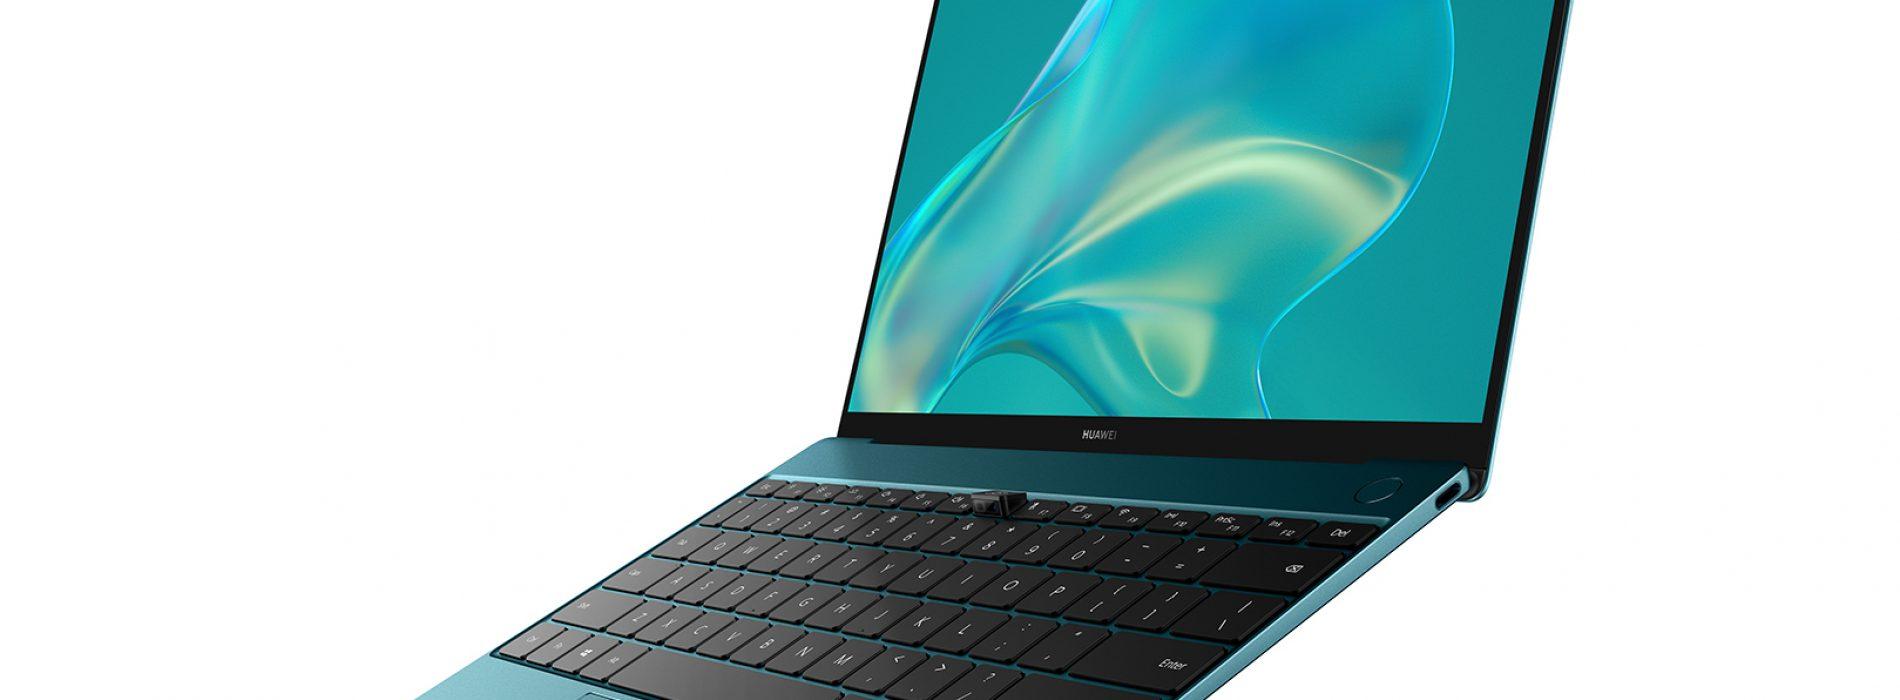 MateBook X: laptop ligera y multitáctil